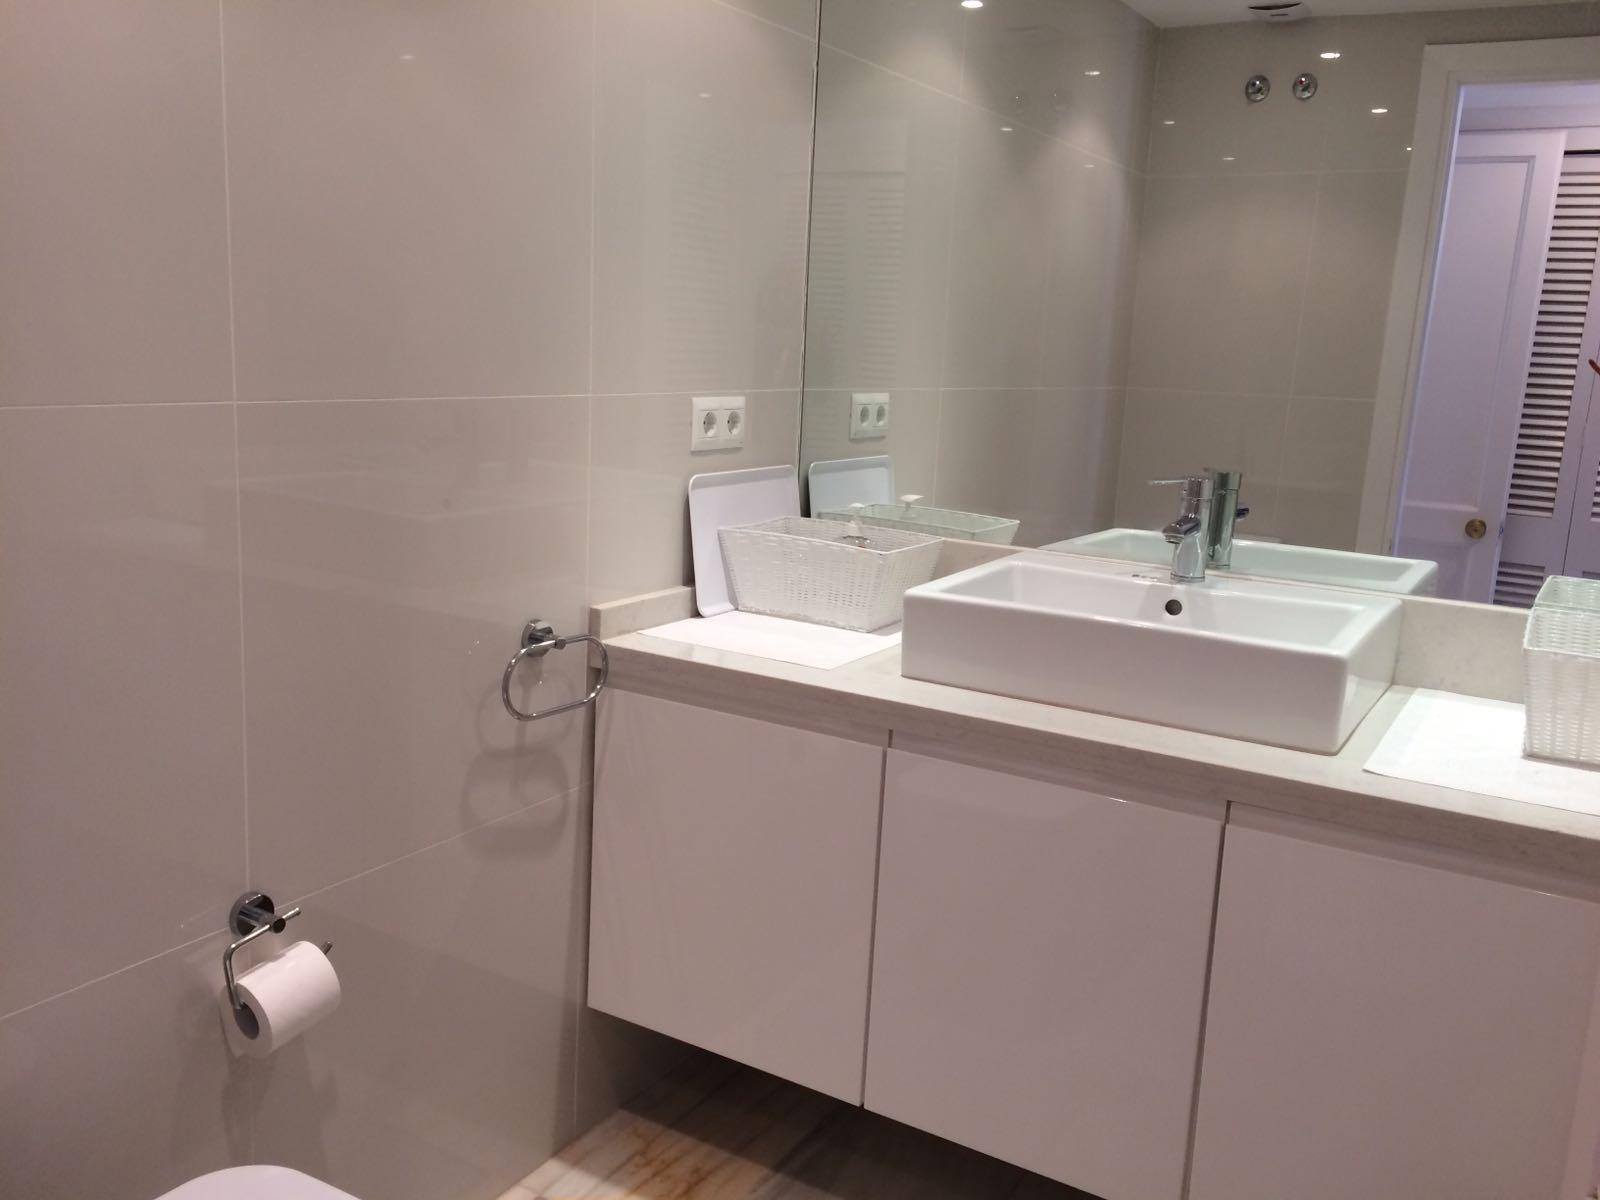 La Alcazaba VII, Apartment available for Holiday Rental in La Alcazaba, Marbella, Spain